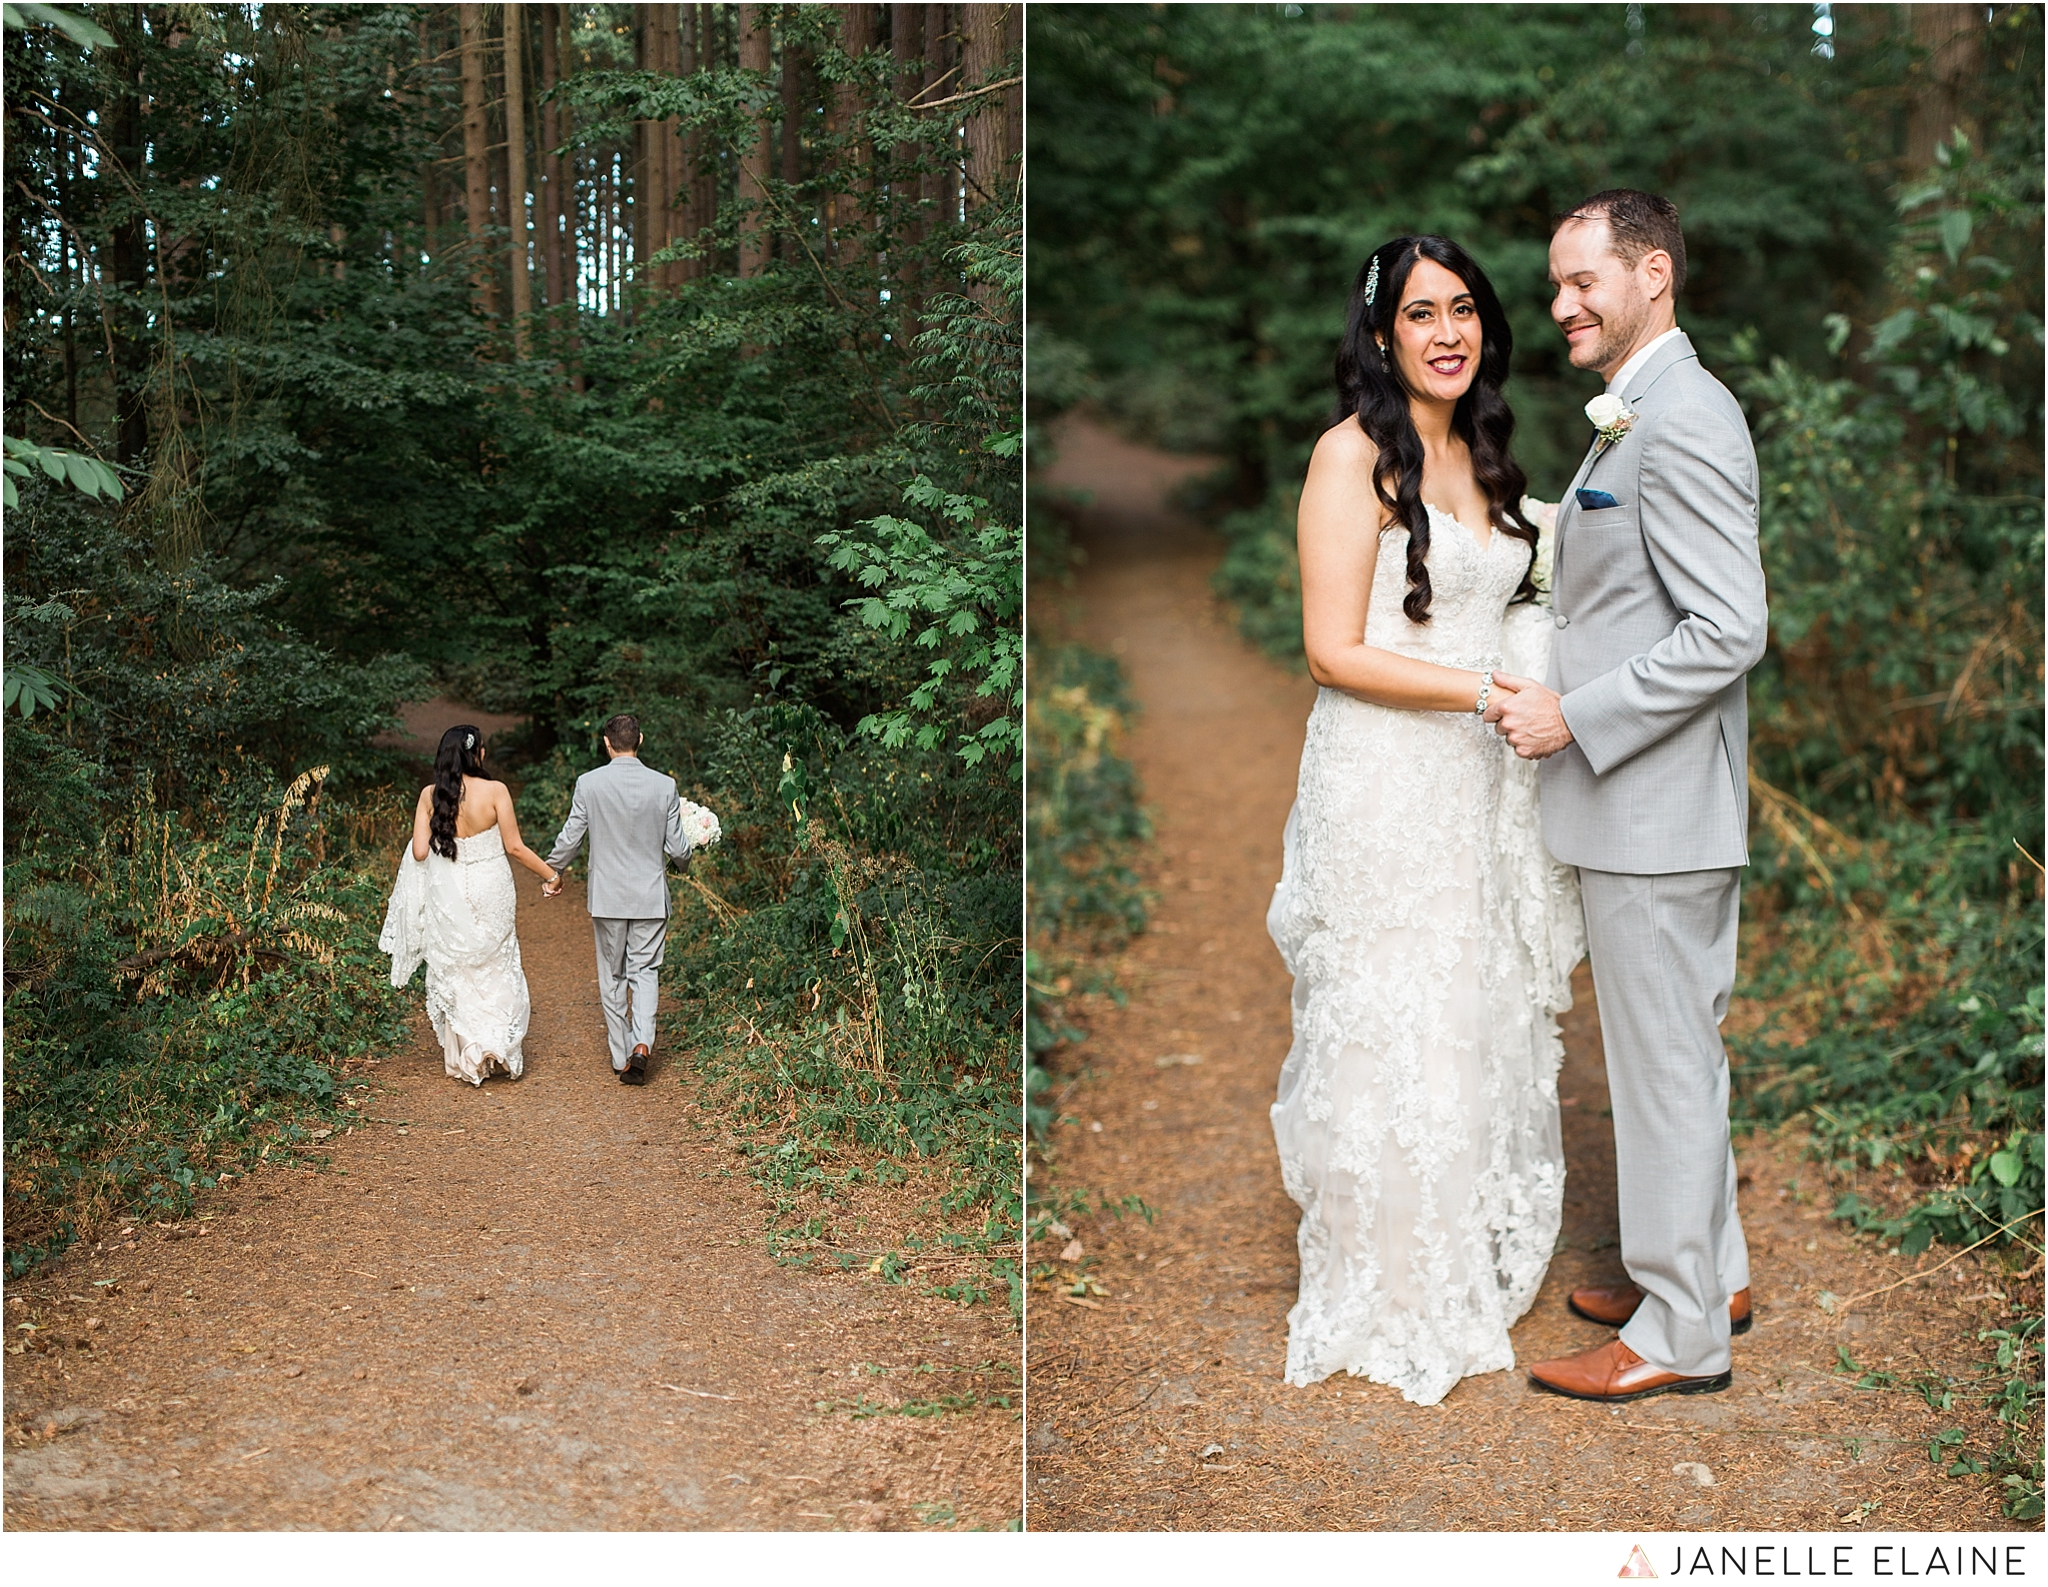 janelle elaine photography-professional wedding photographer-seattle-bellevue-robinswood house-200.jpg